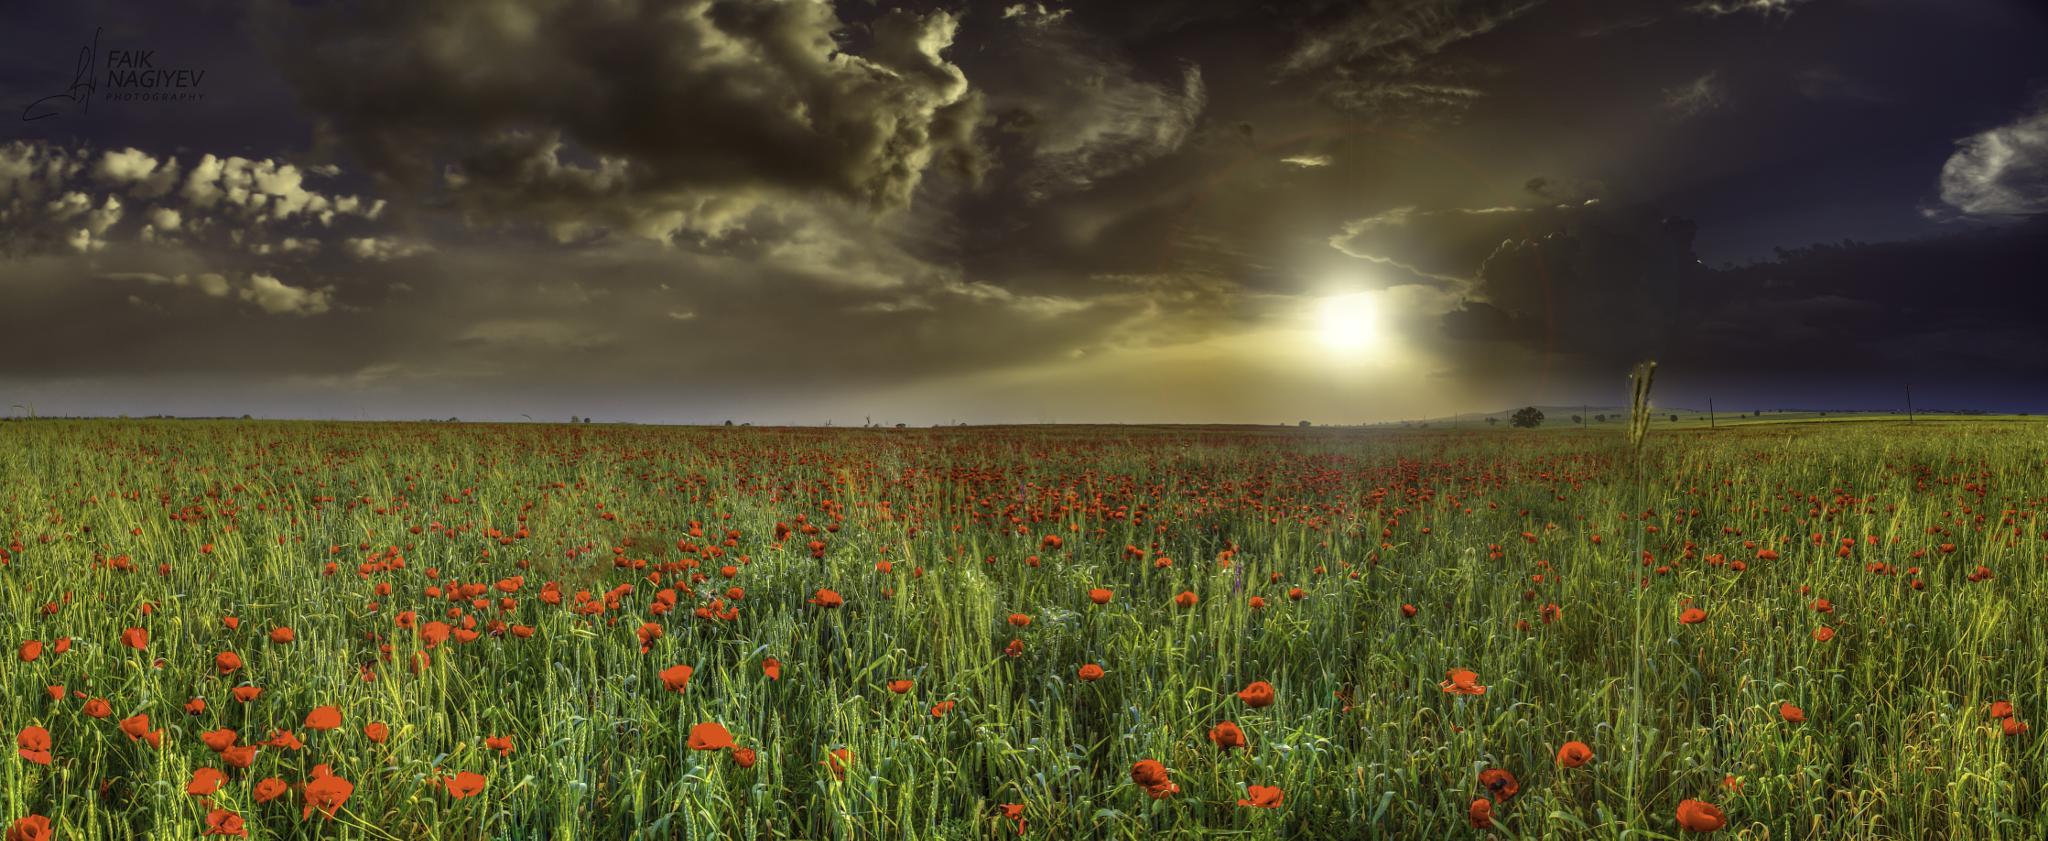 Poppy Field in Sunset by Faik Nagiyev